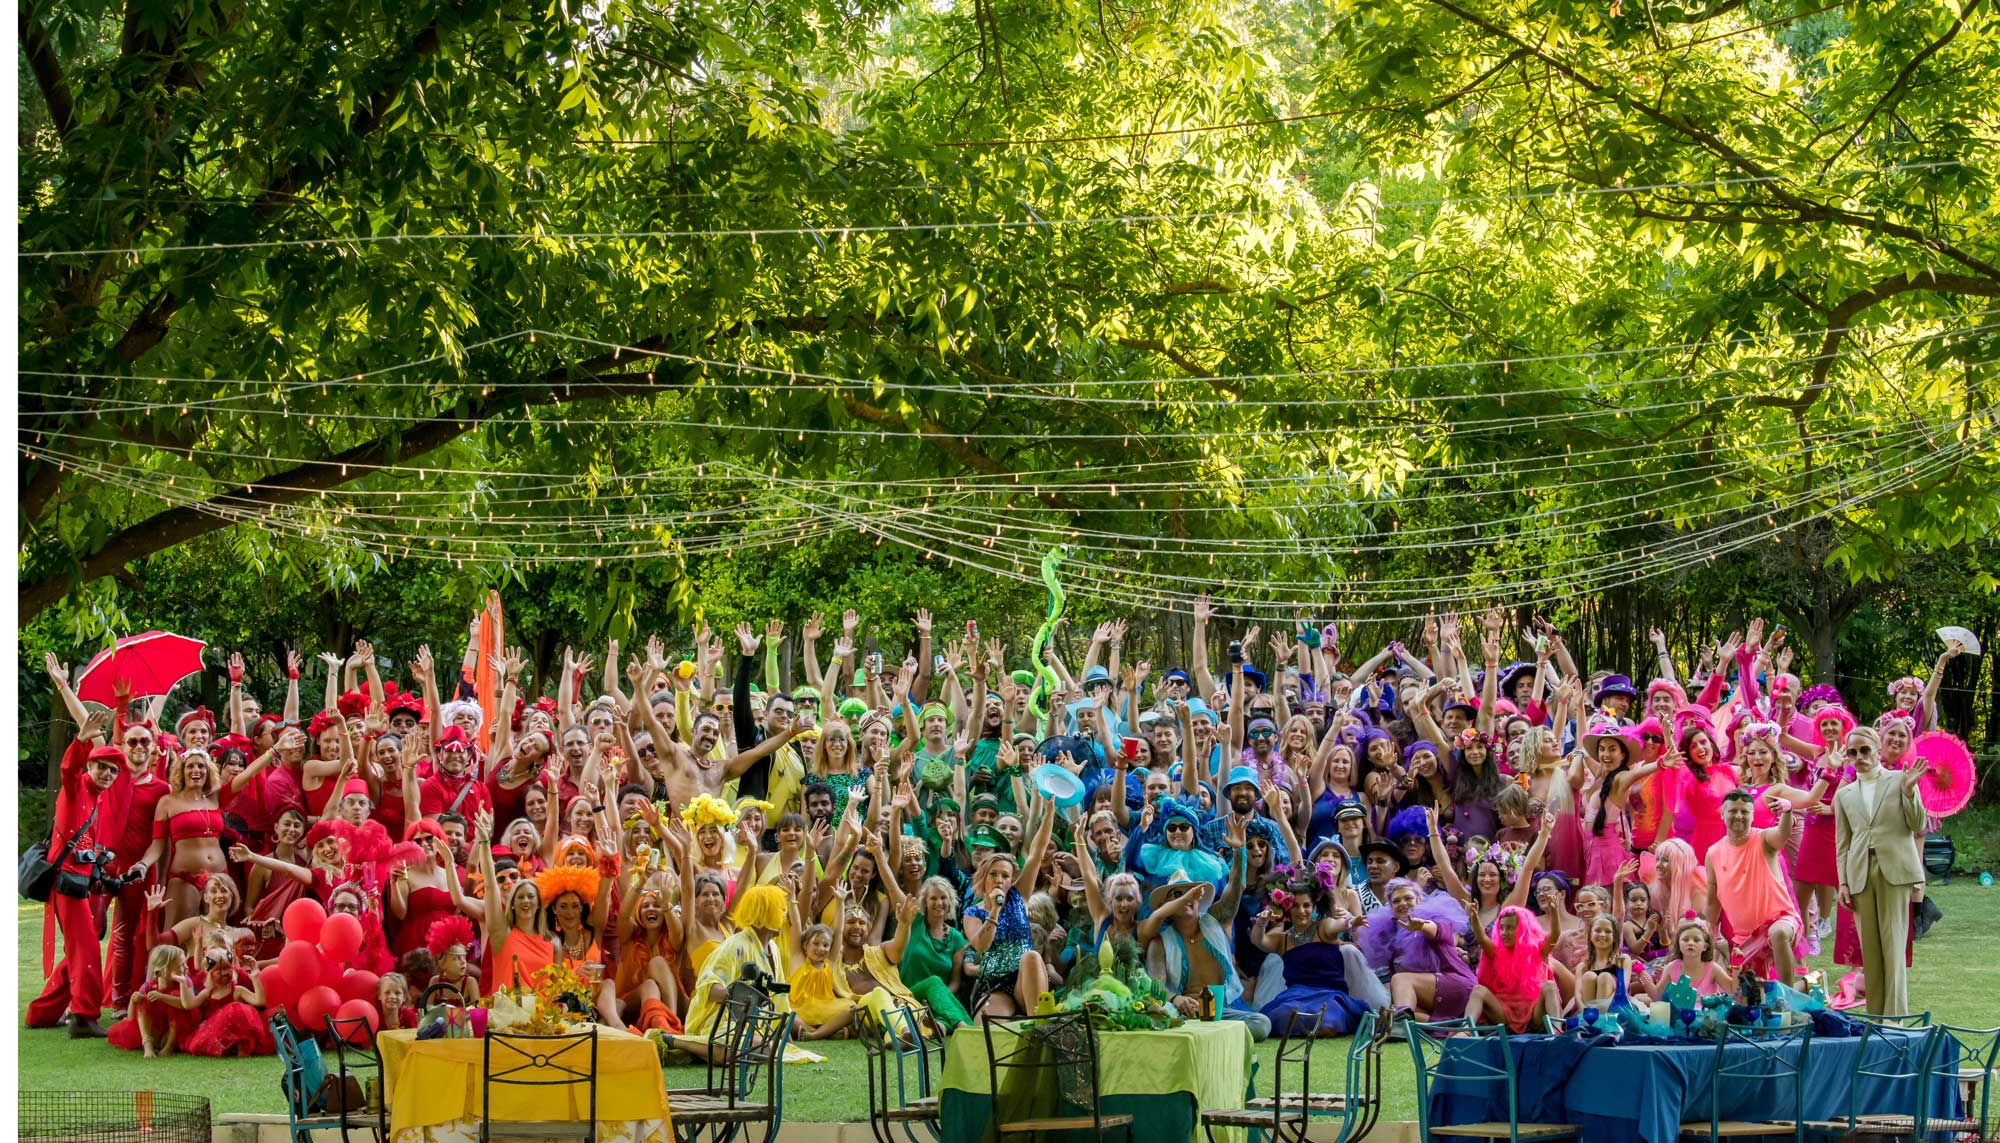 Over the Rainbow Party - Blazing Swan Fundraiser Photo credit Ren Mcgann